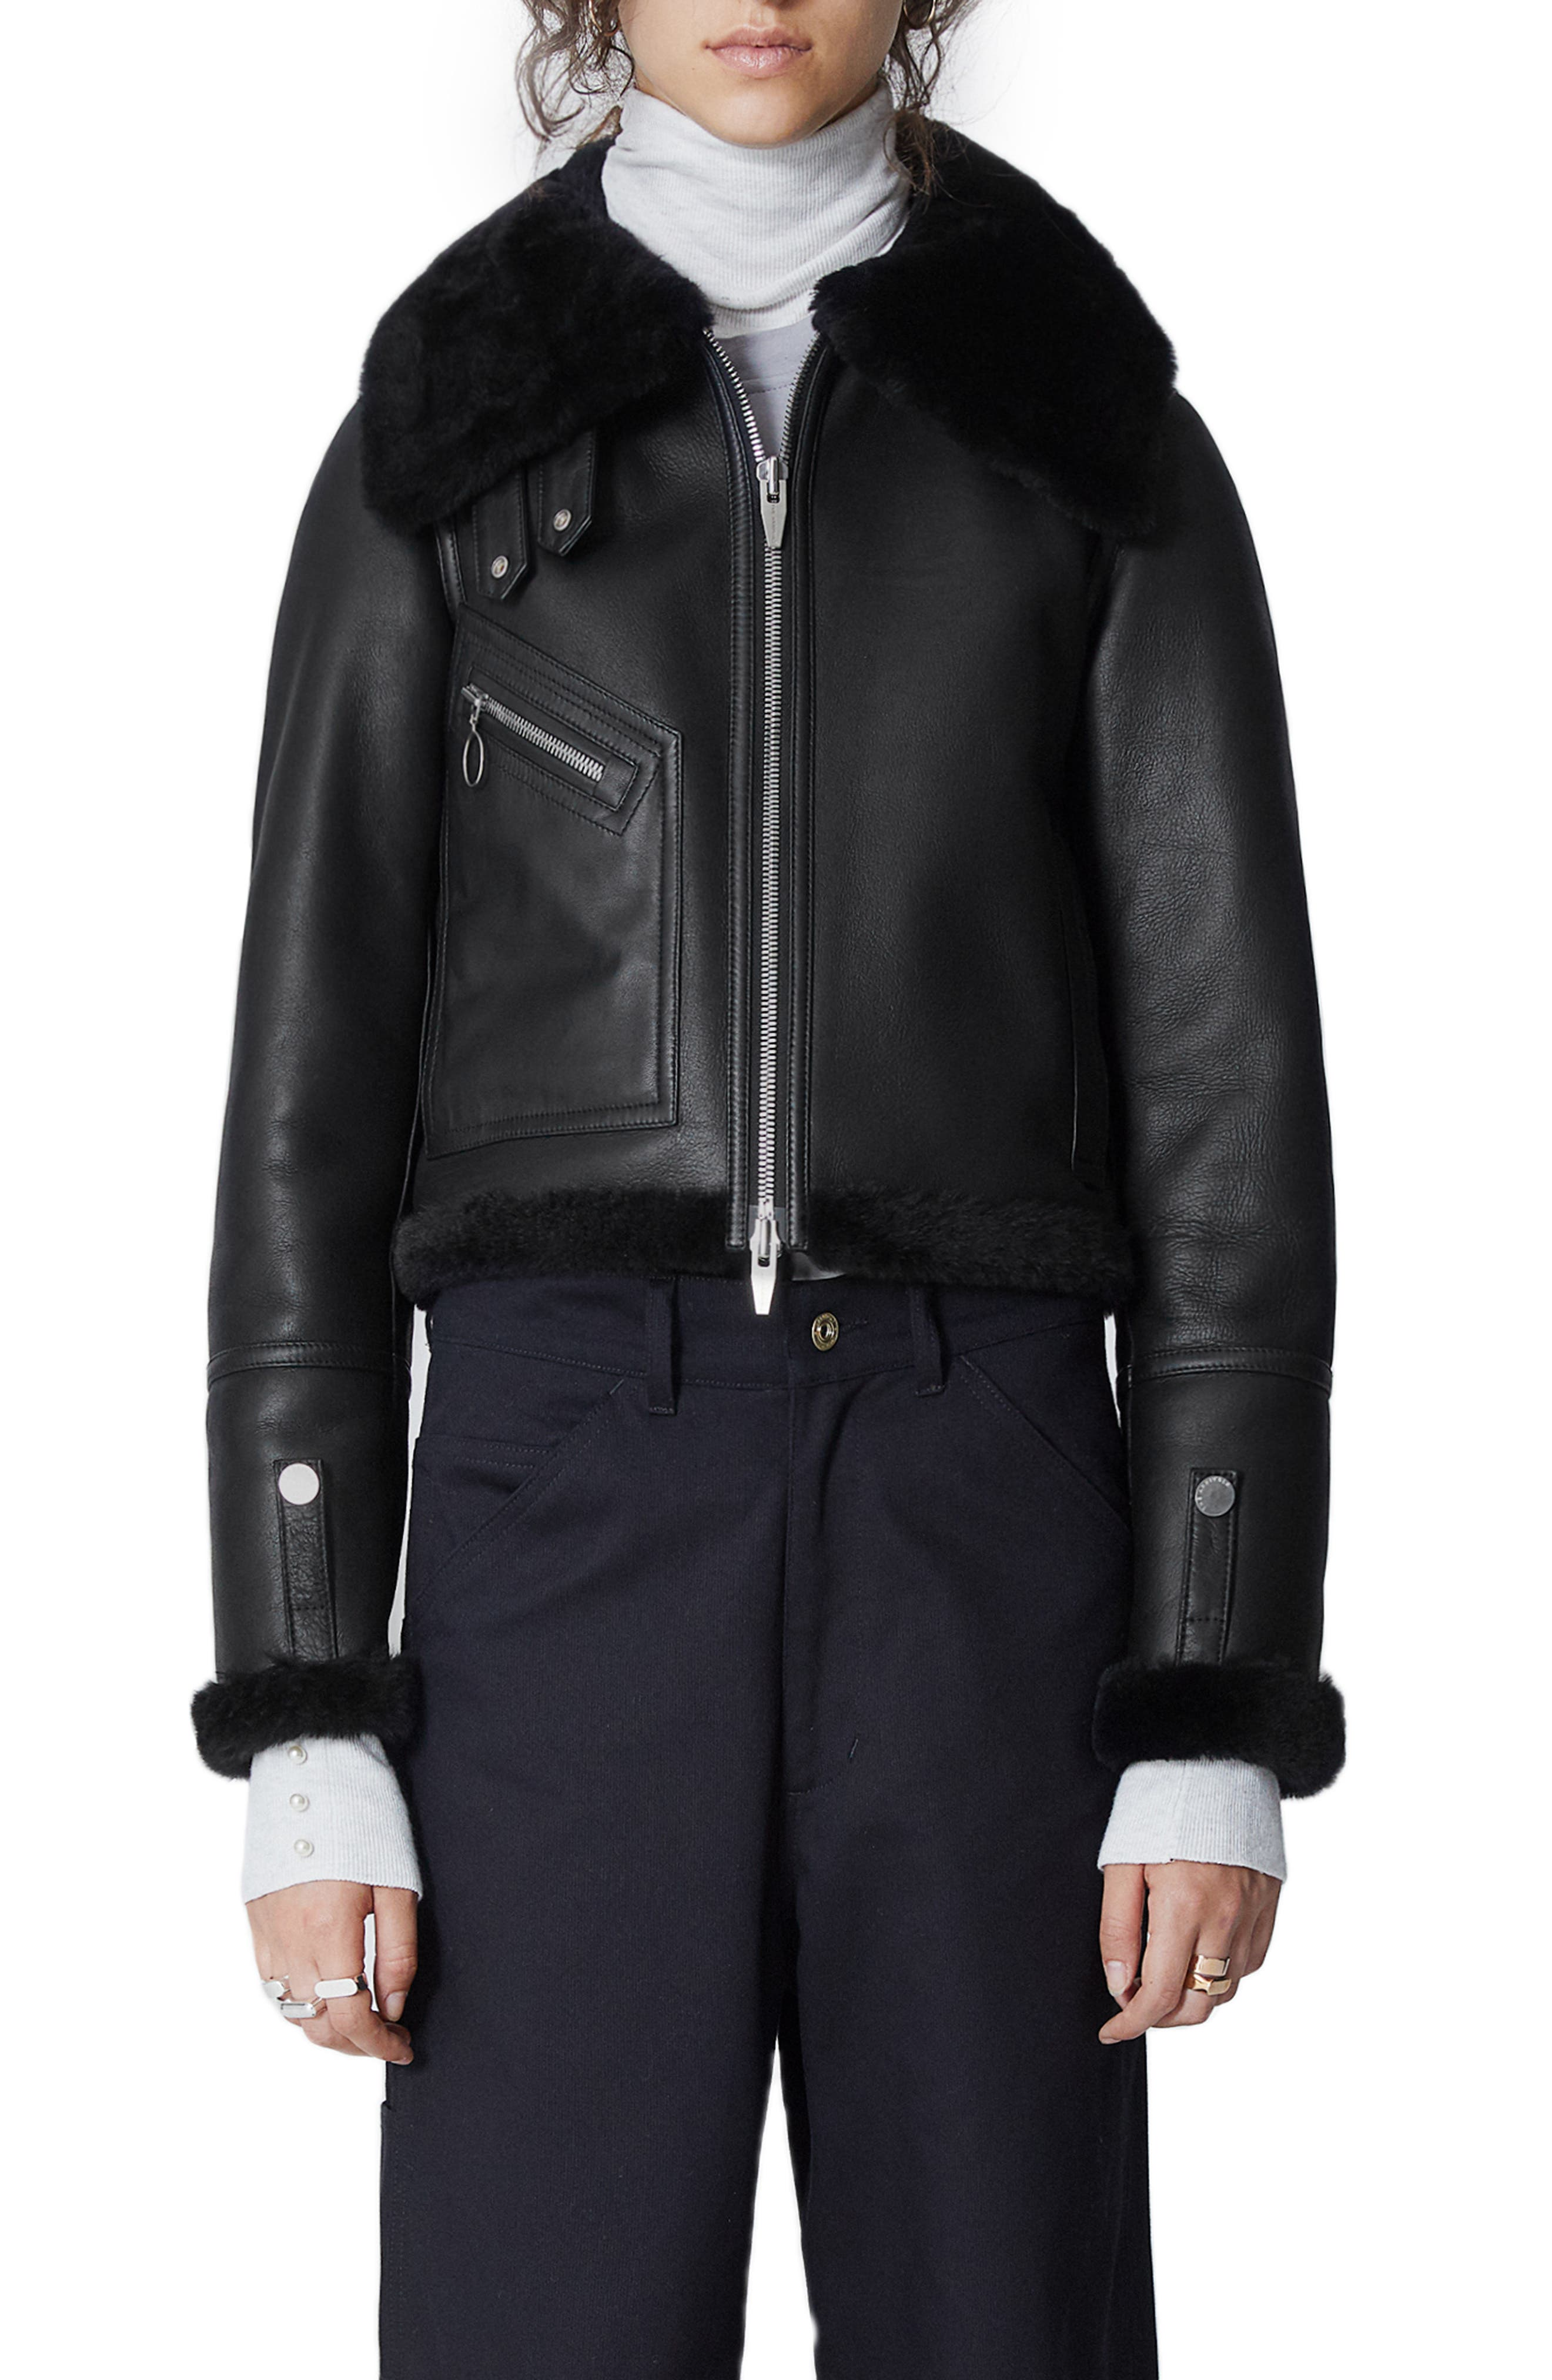 THE ARRIVALS Moya Mini Leather & Genuine Shearling Jacket in Black